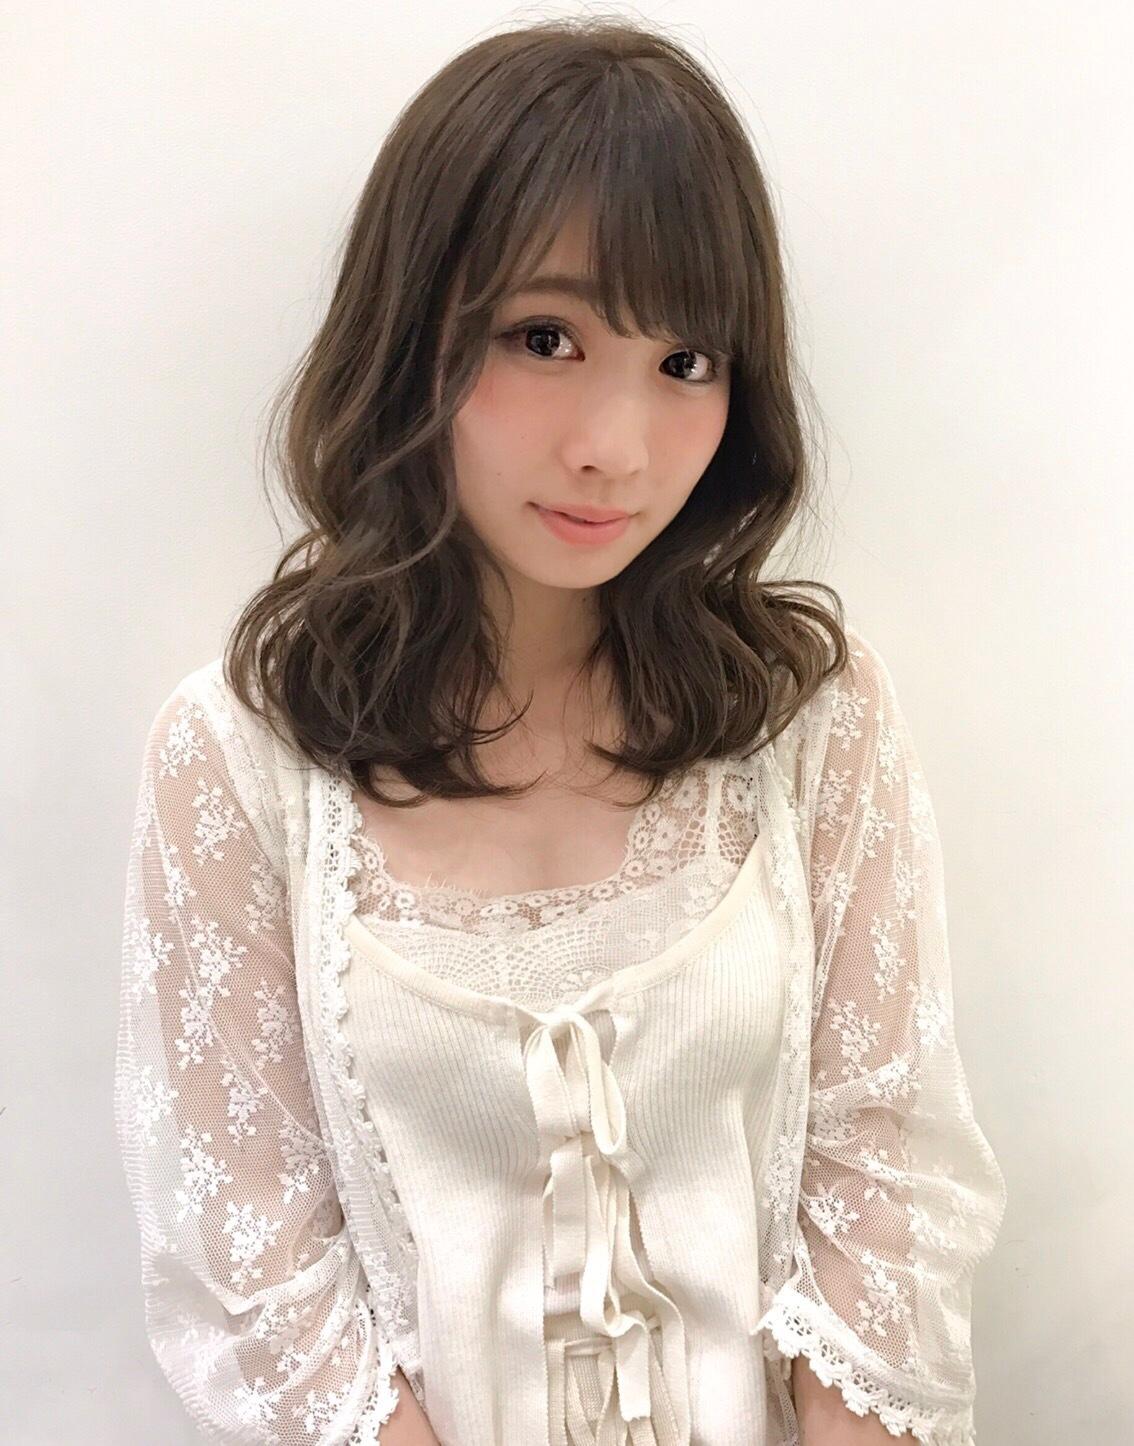 Newヘアカラー♡オリーブベージュSHIMA_1_1